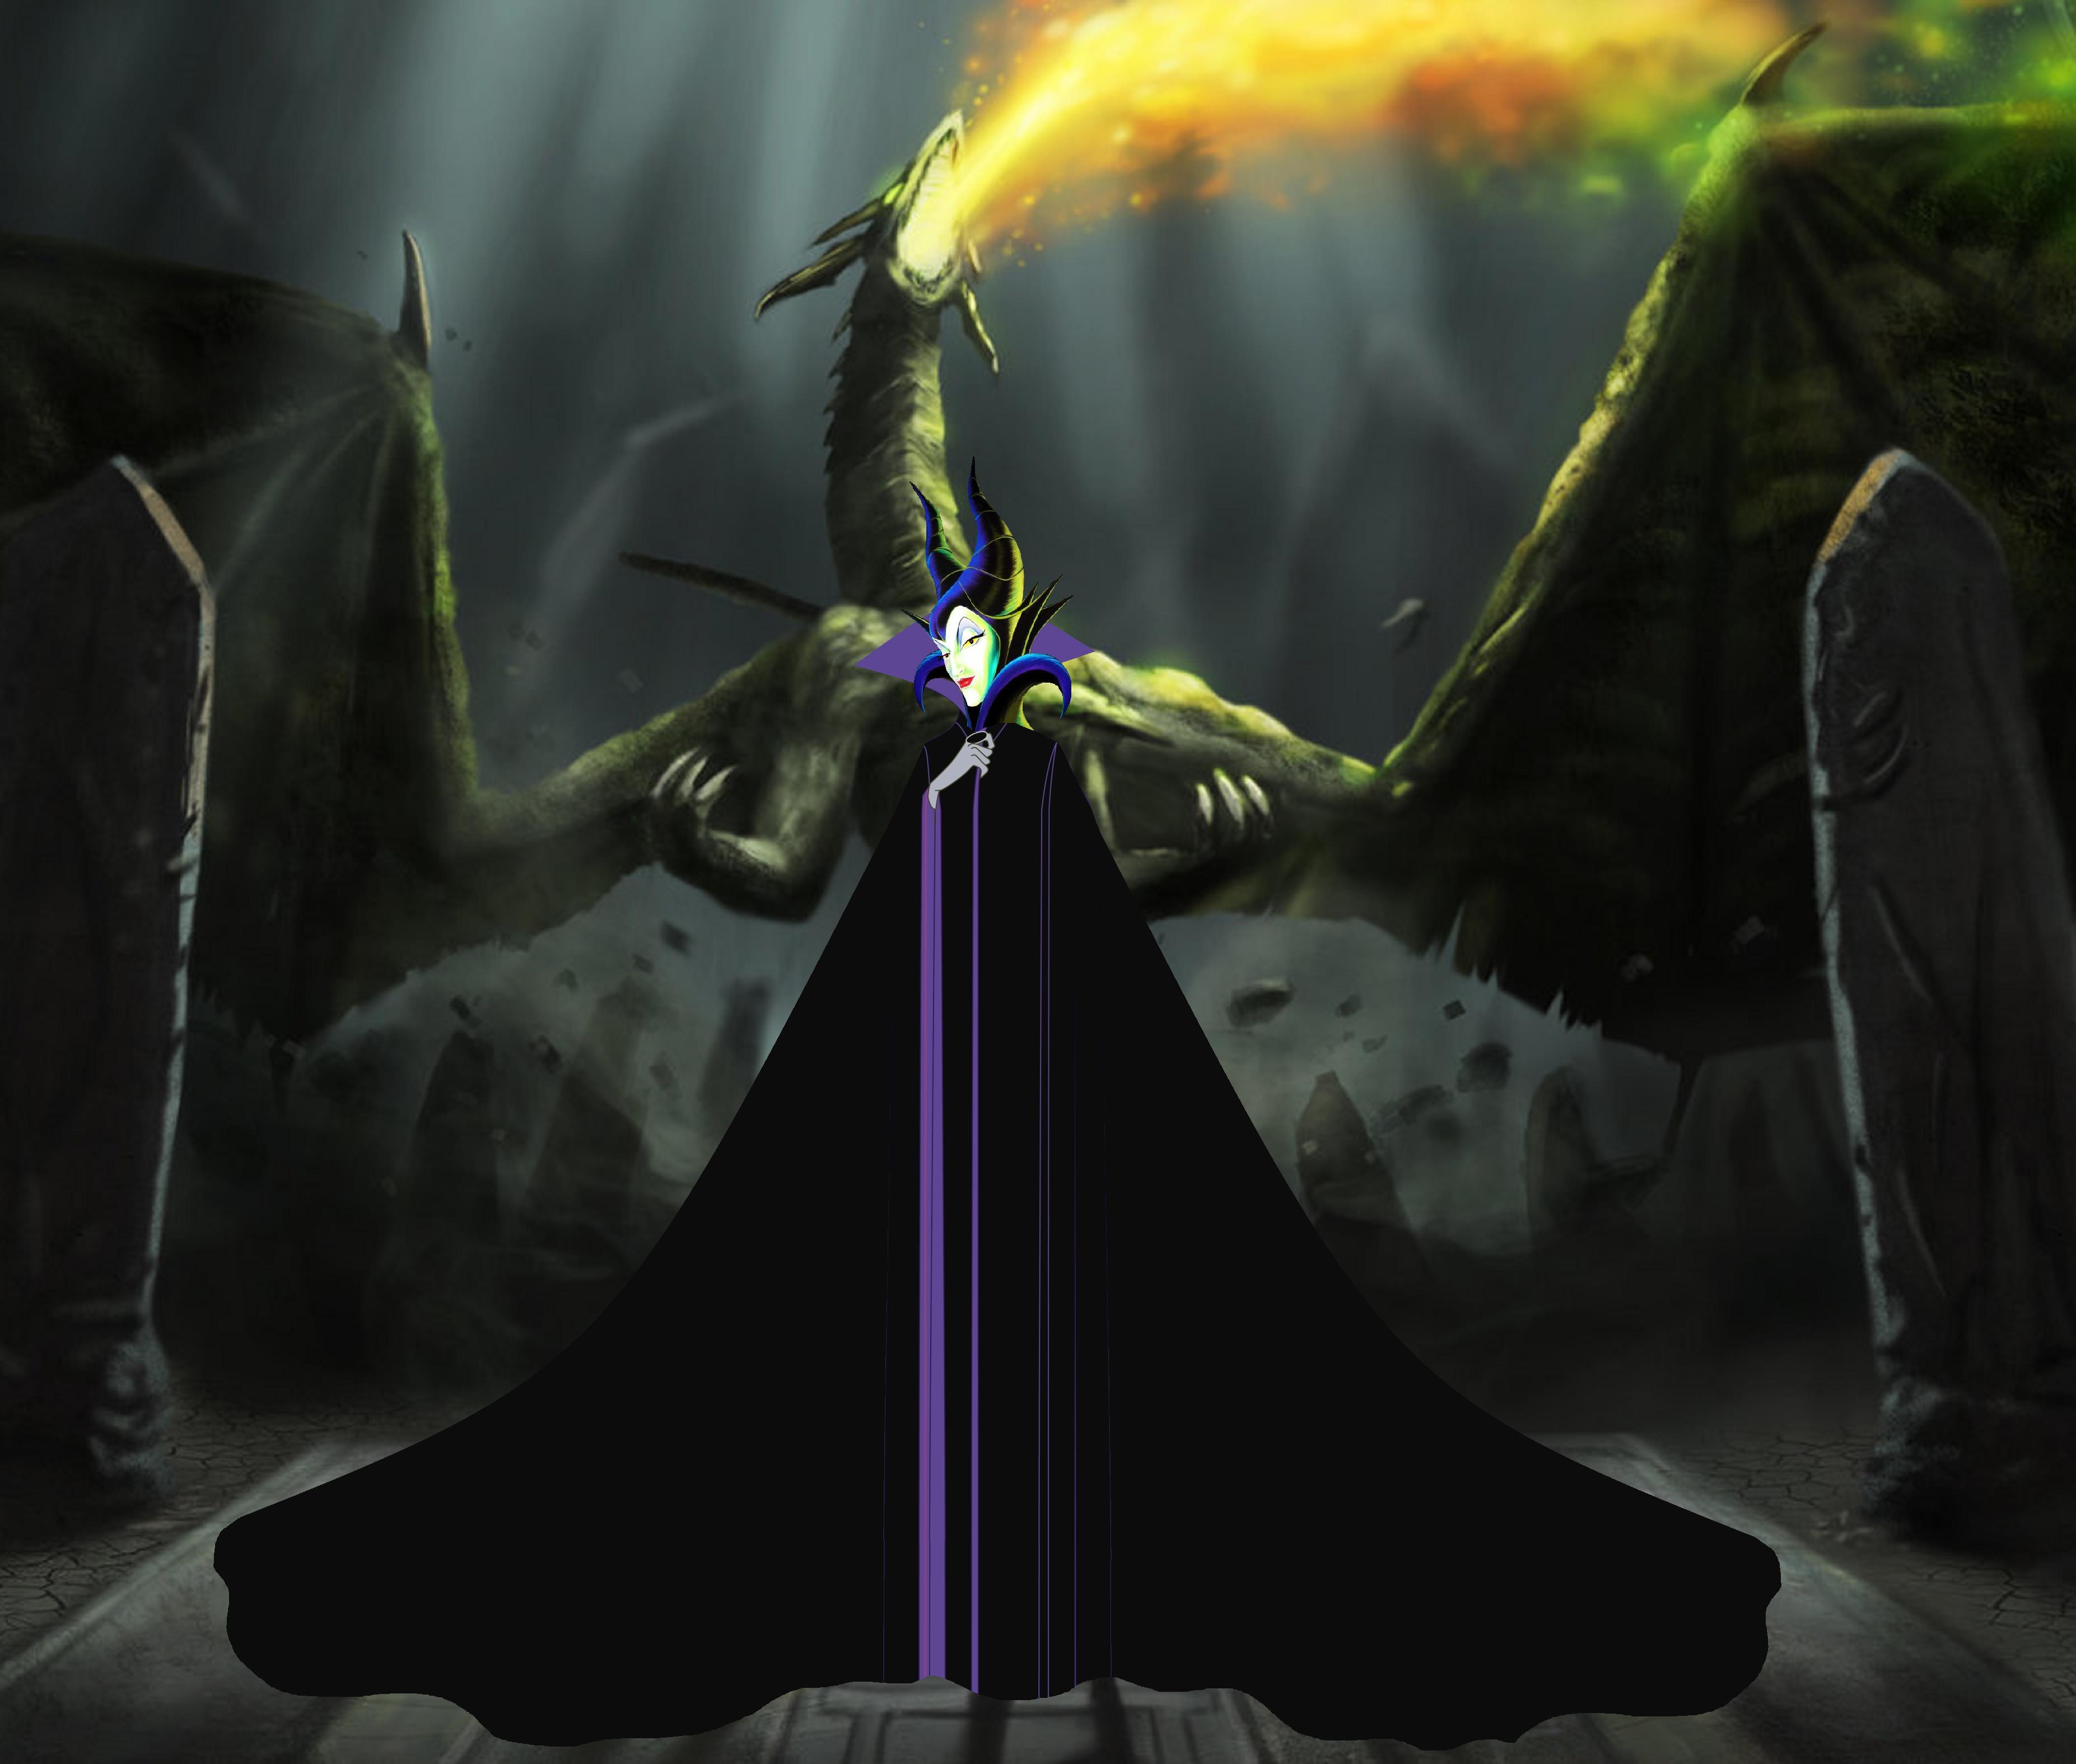 Maleficent Dragon Wallpaper Maleficent Dragon Powe...